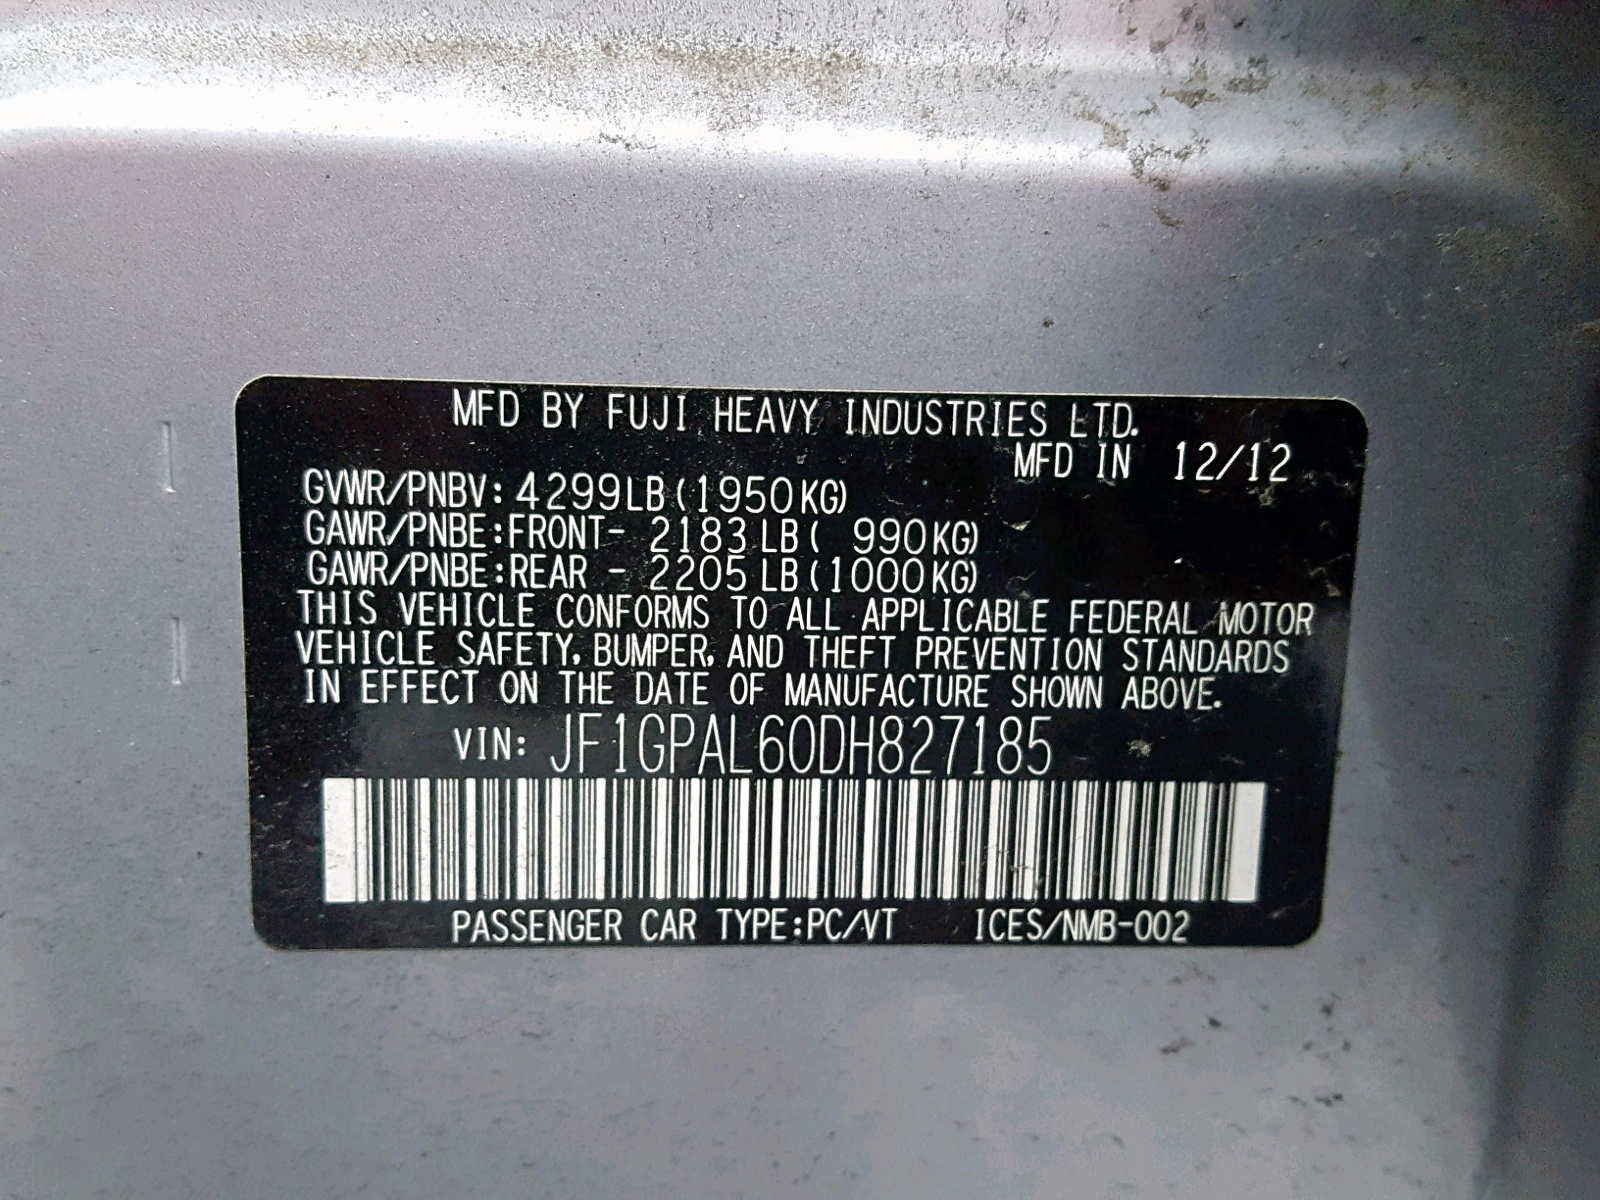 JF1GPAL60DH827185 - 2013 Subaru Impreza Sp 2.0L